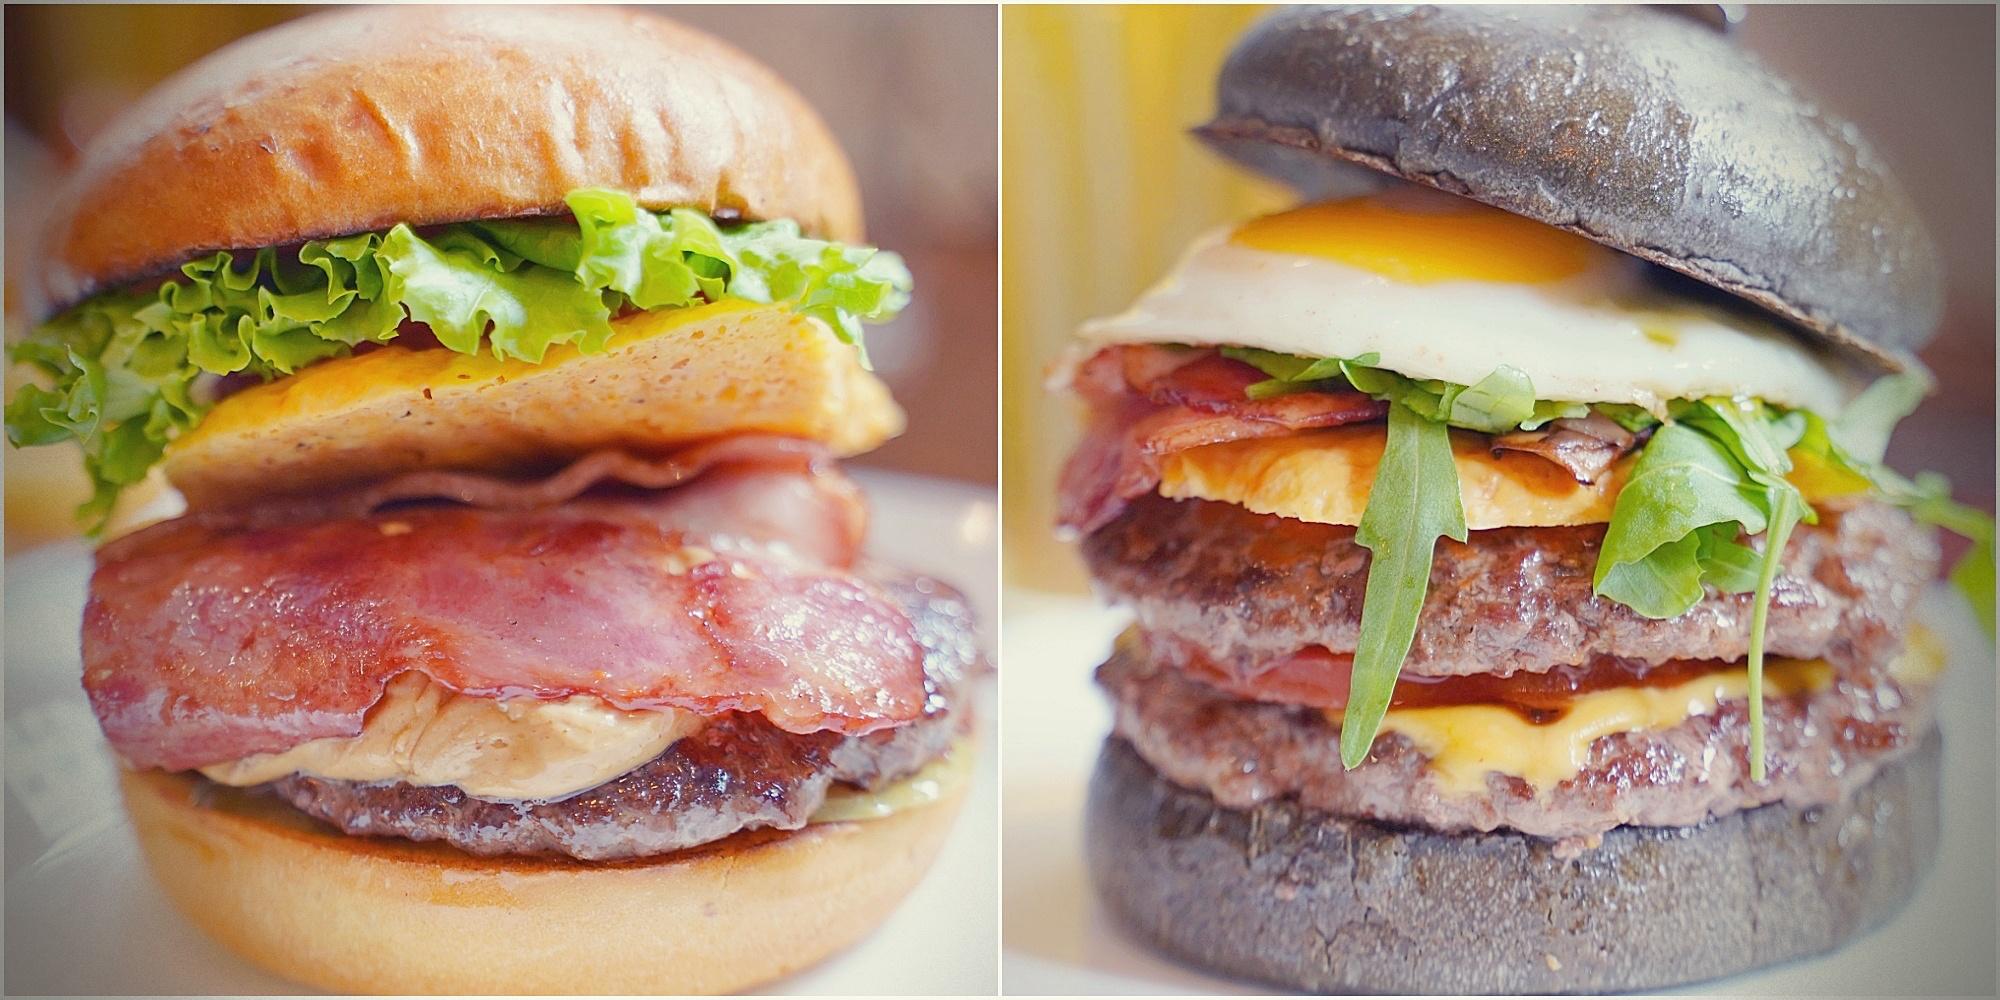 Selfish Burger 喀漢堡|四四南村好吃漢堡|台北信義區創意漢堡(菜單、價格)